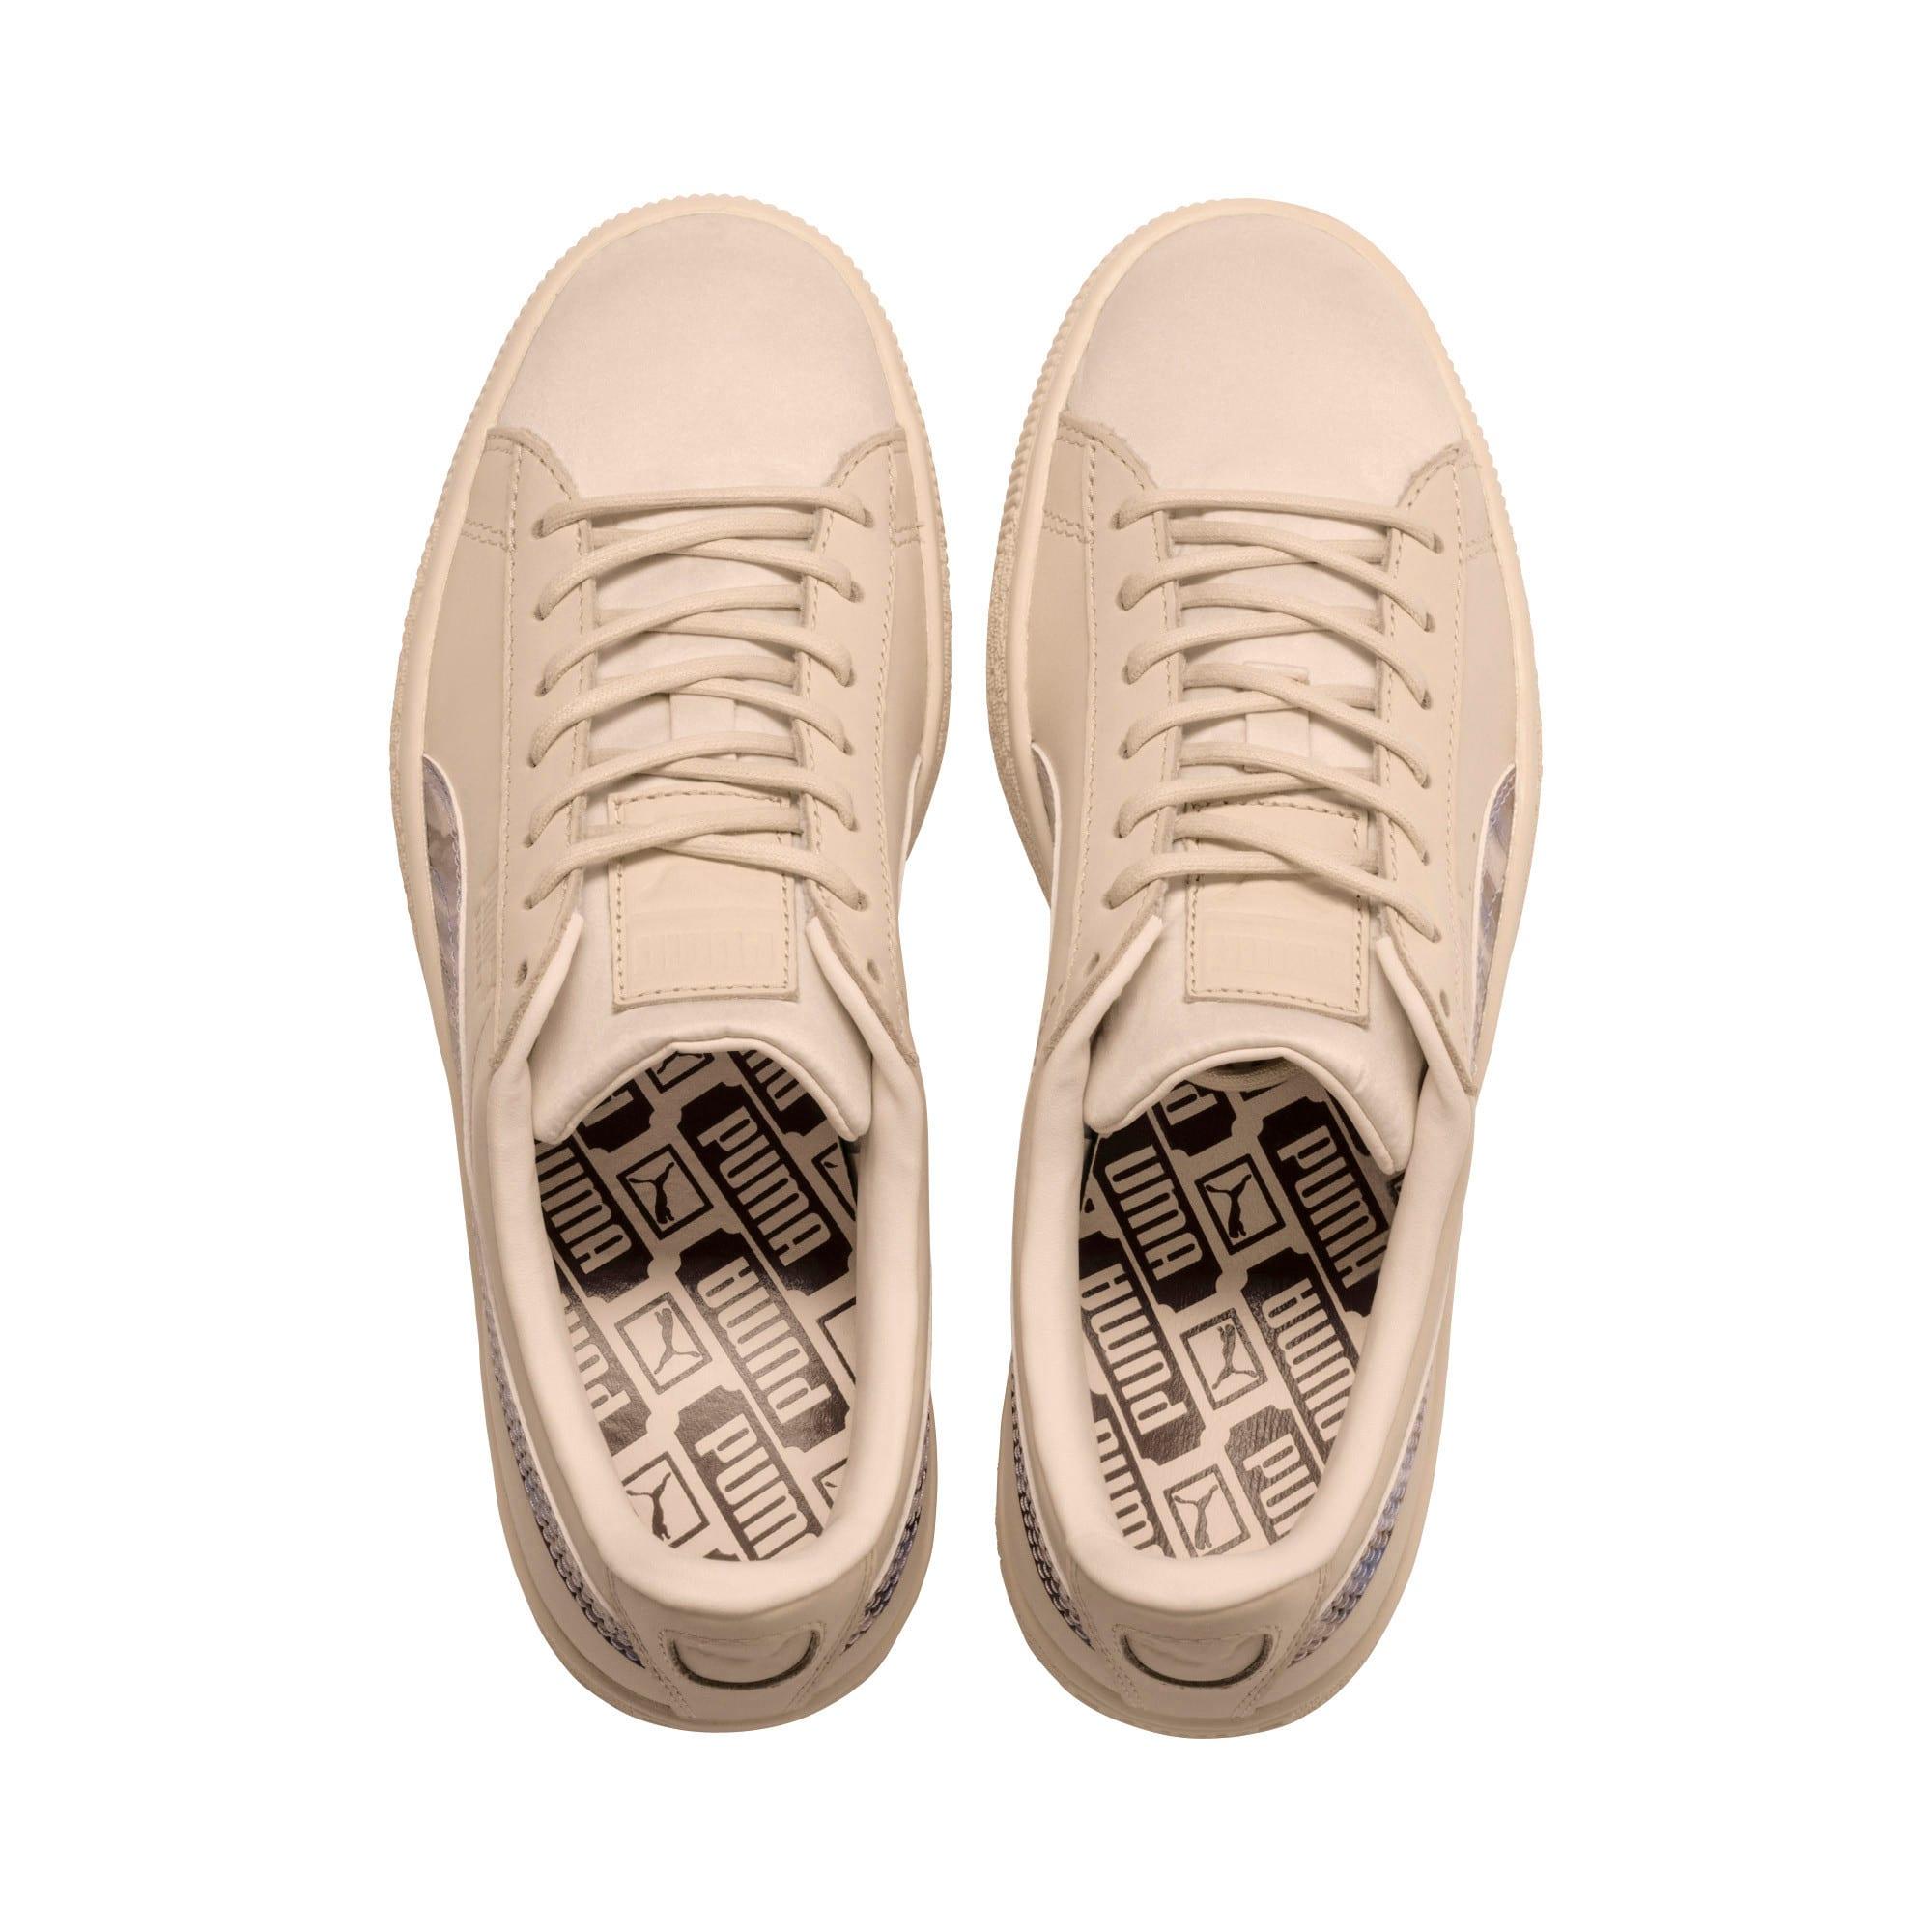 Thumbnail 6 of Basket Classic Mimicry Women's Sneakers, Vanilla Cream-Vanilla Cream, medium